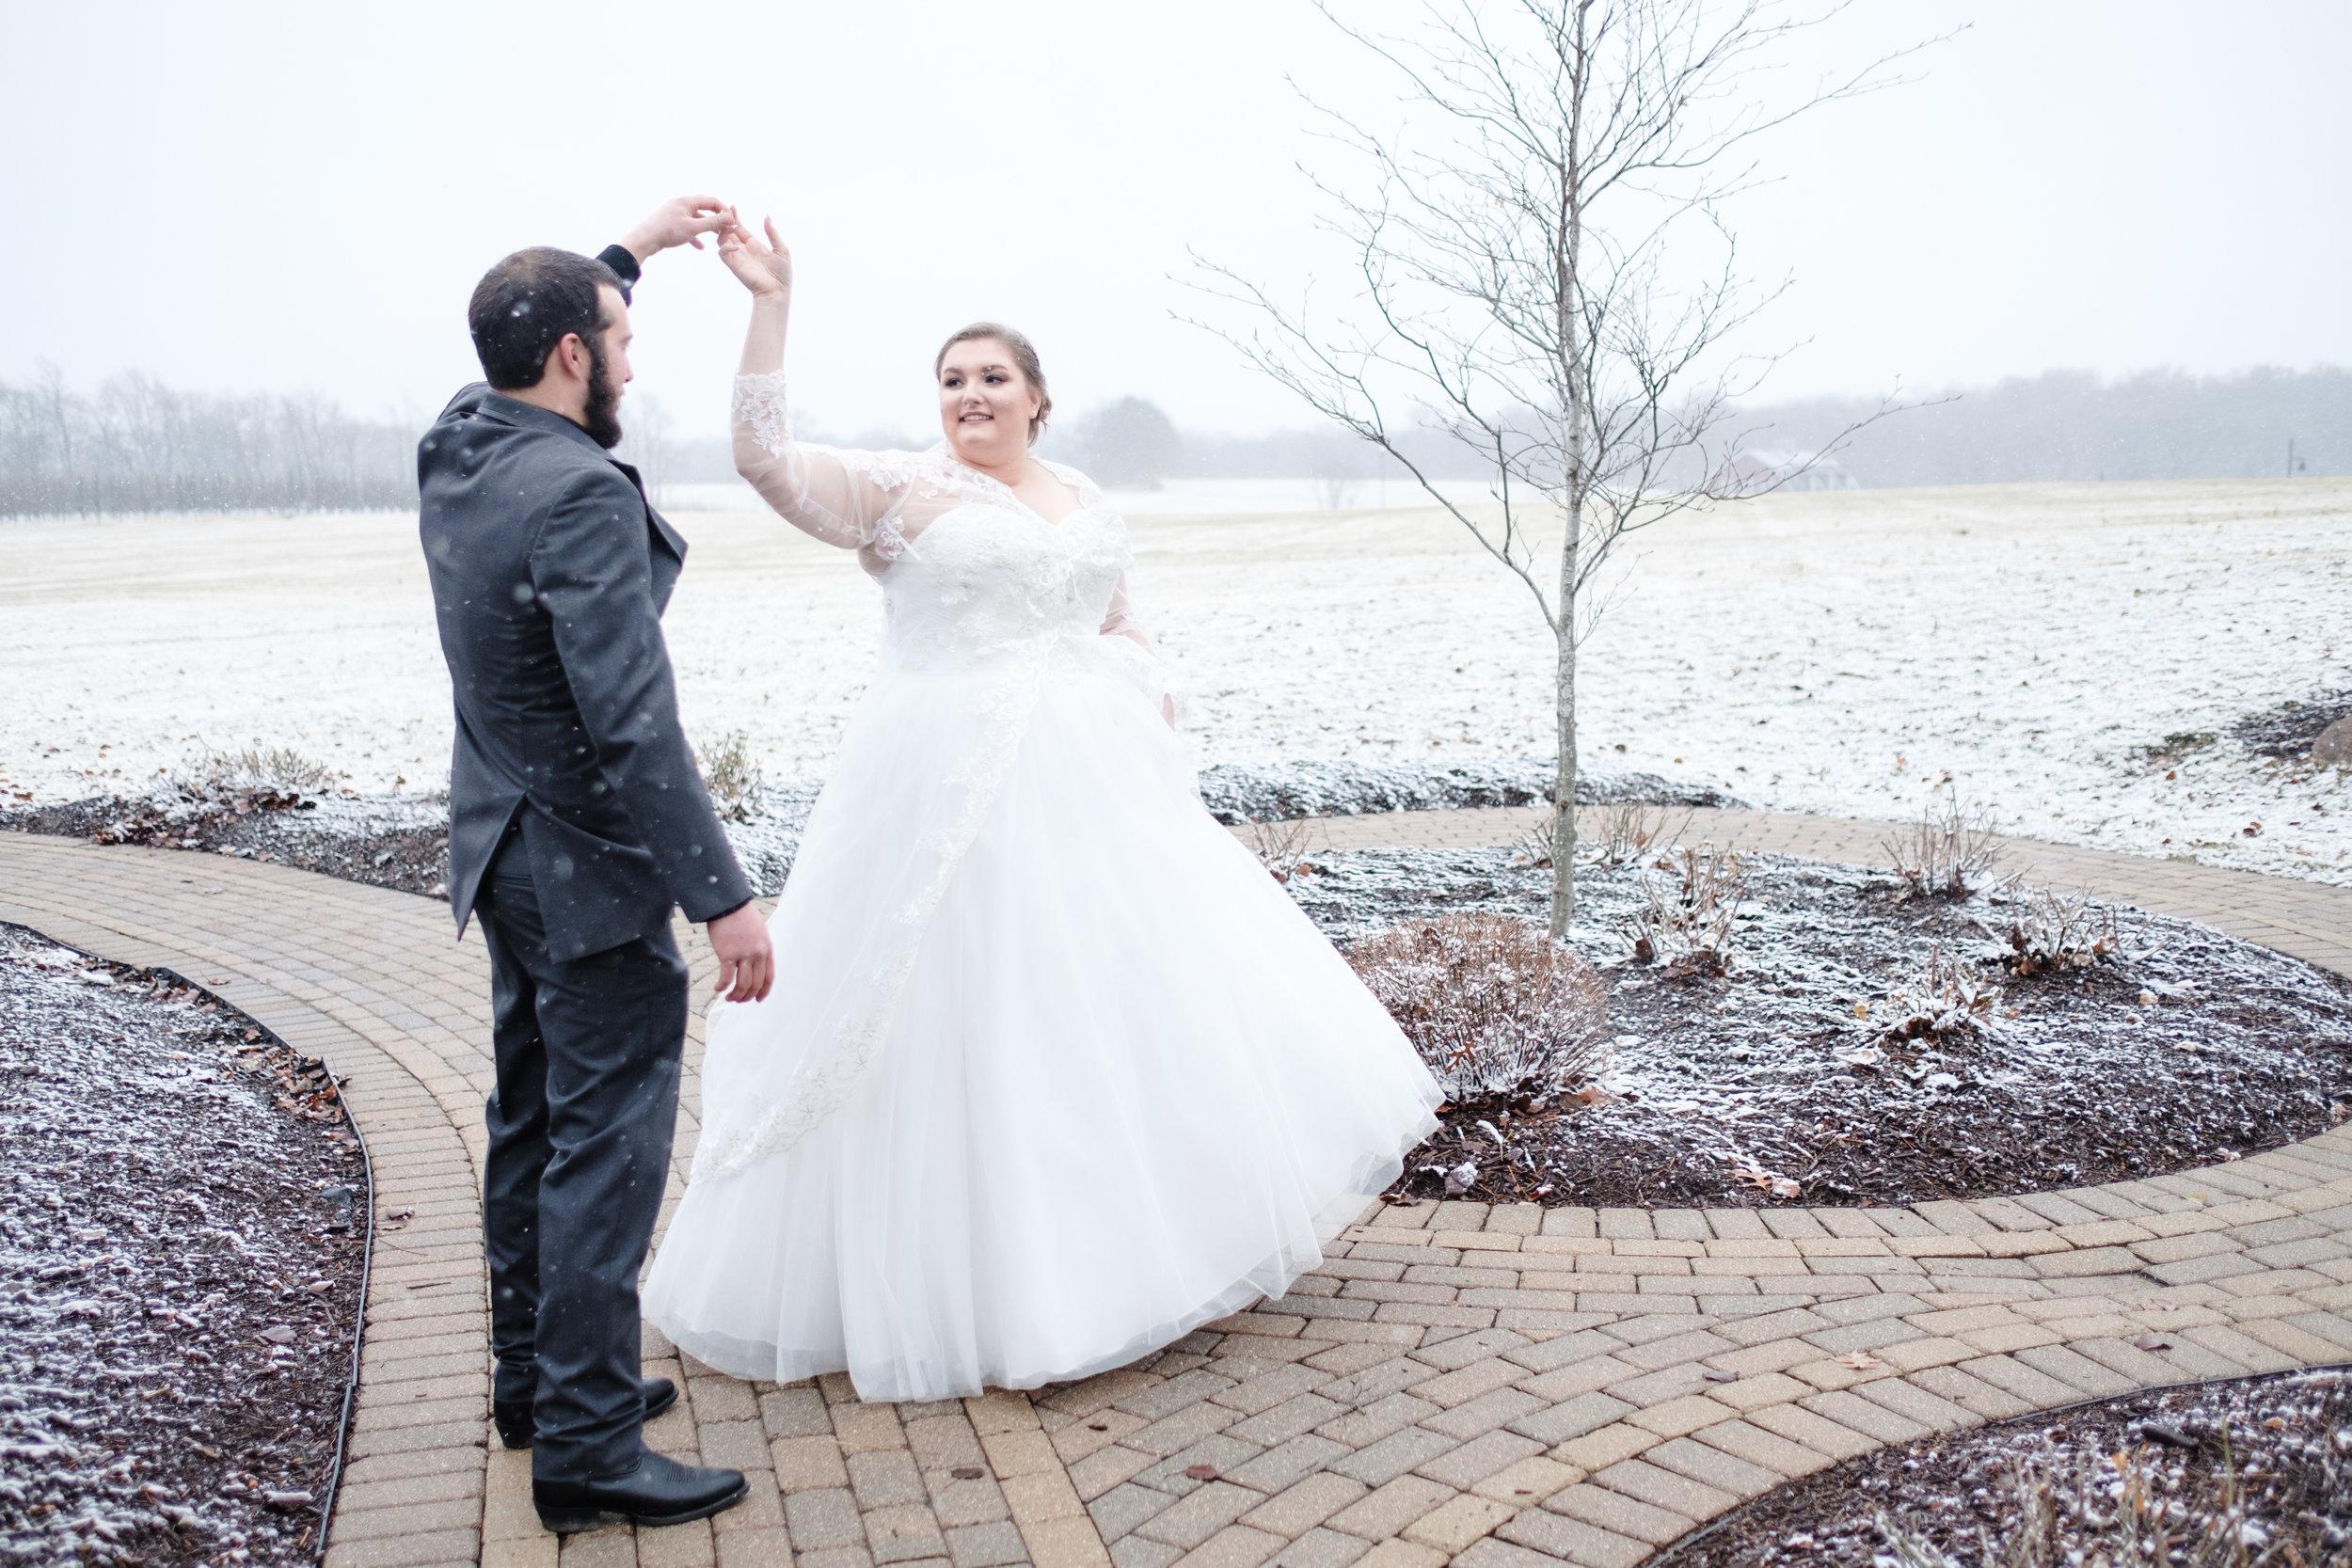 18-12-28 Corinne-Henry-Pavilion-Wedding-138.jpg